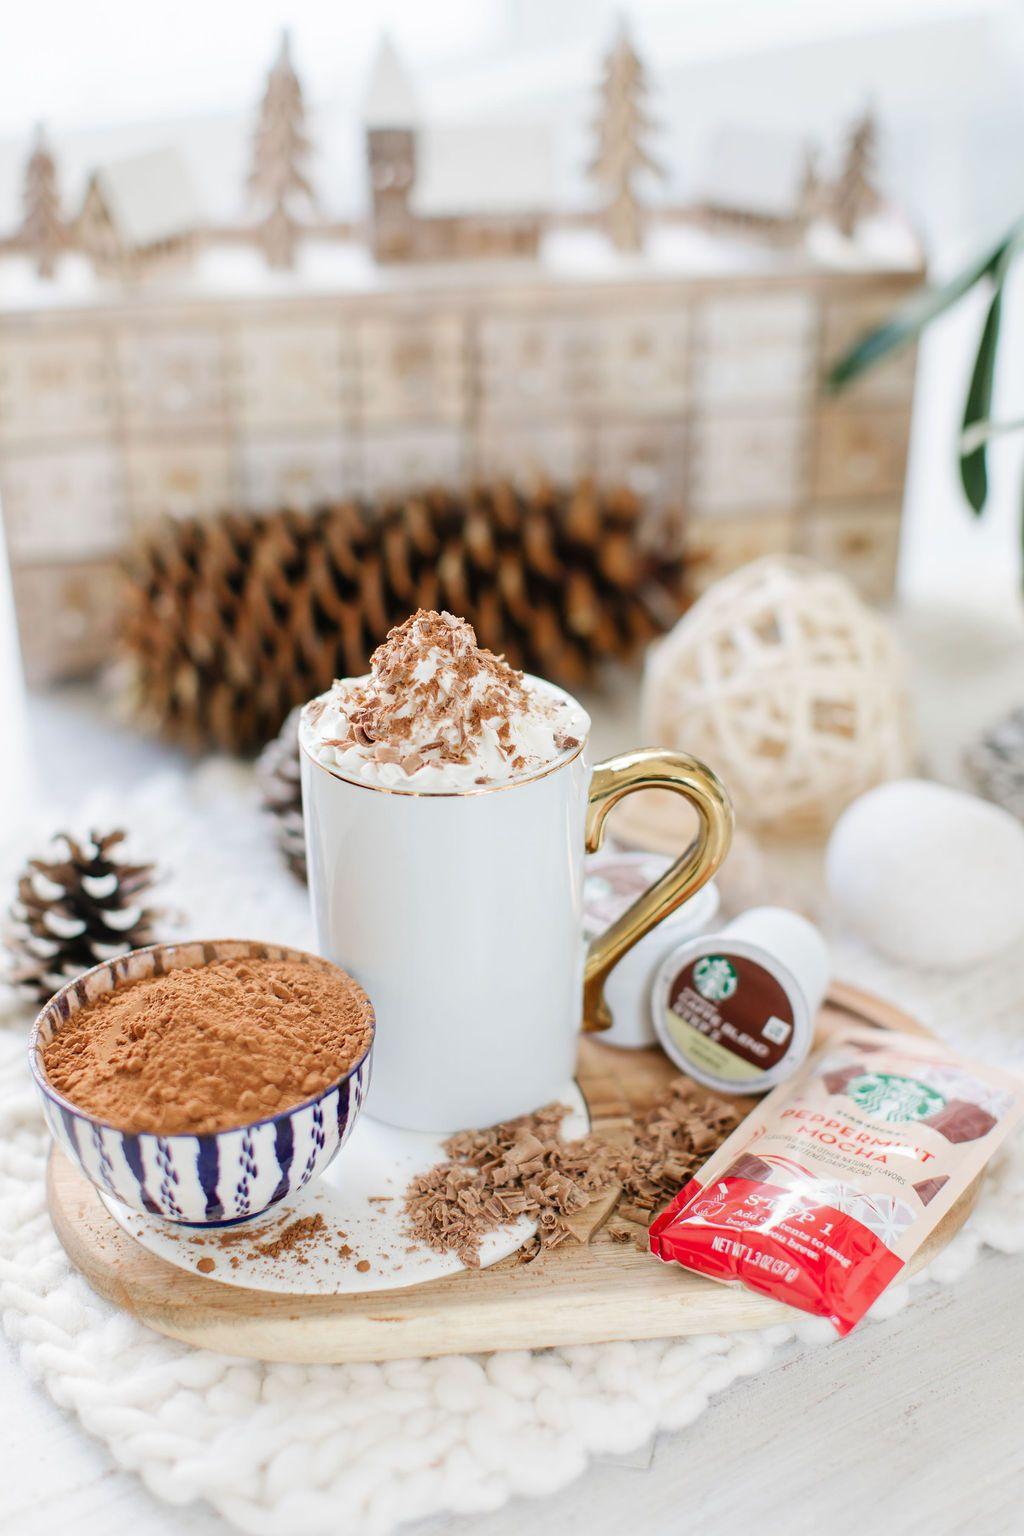 Peppermint Mocha Starbucks Holiday Drinks 3 Ways